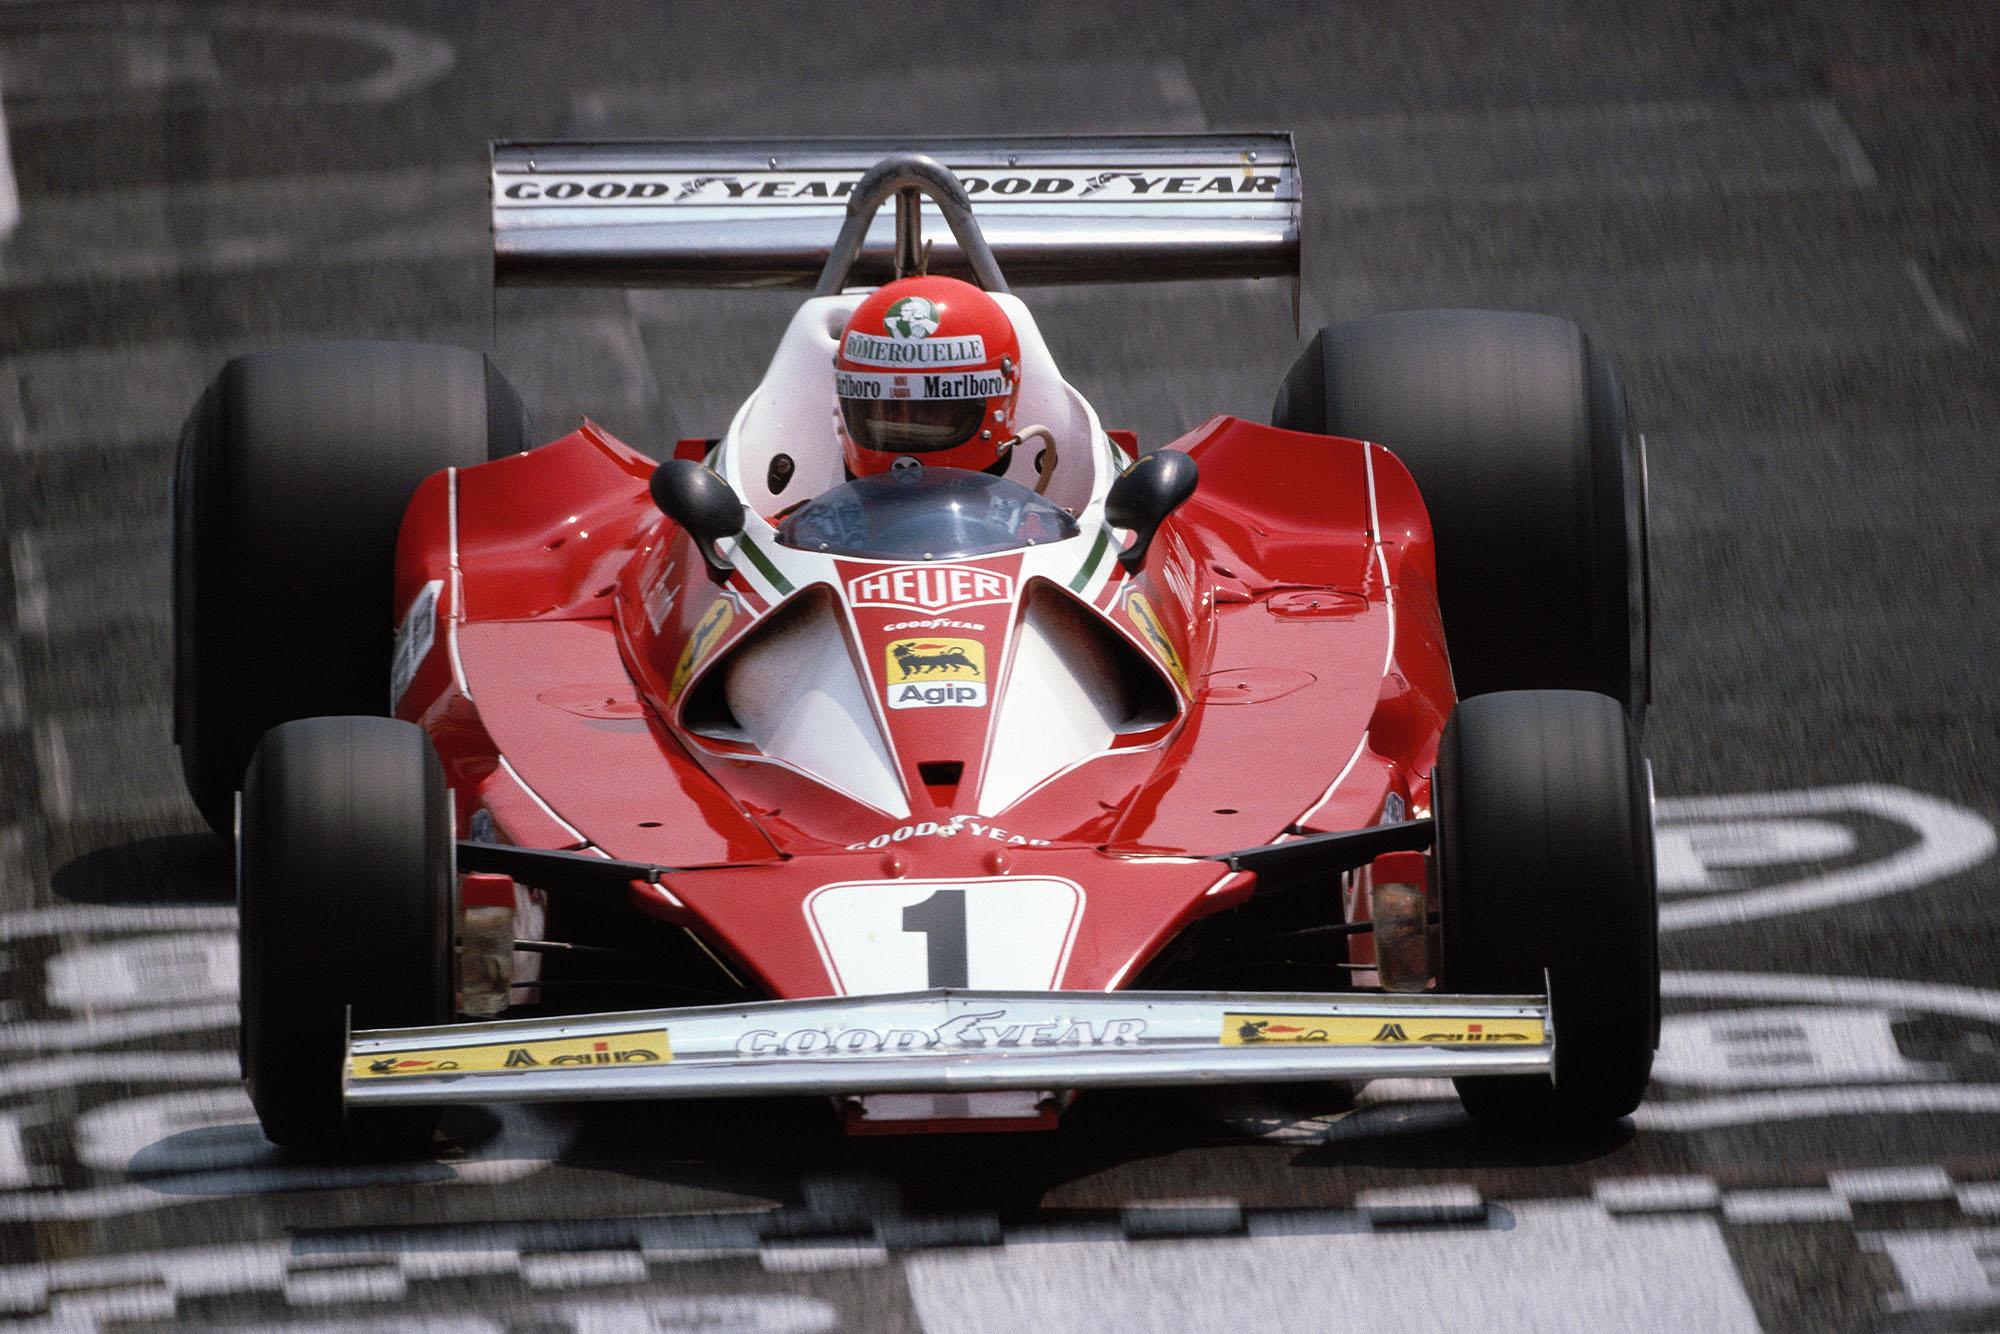 Ferrari's Niki Lauda at the 1976 French Grand Prix, Paul Ricard.